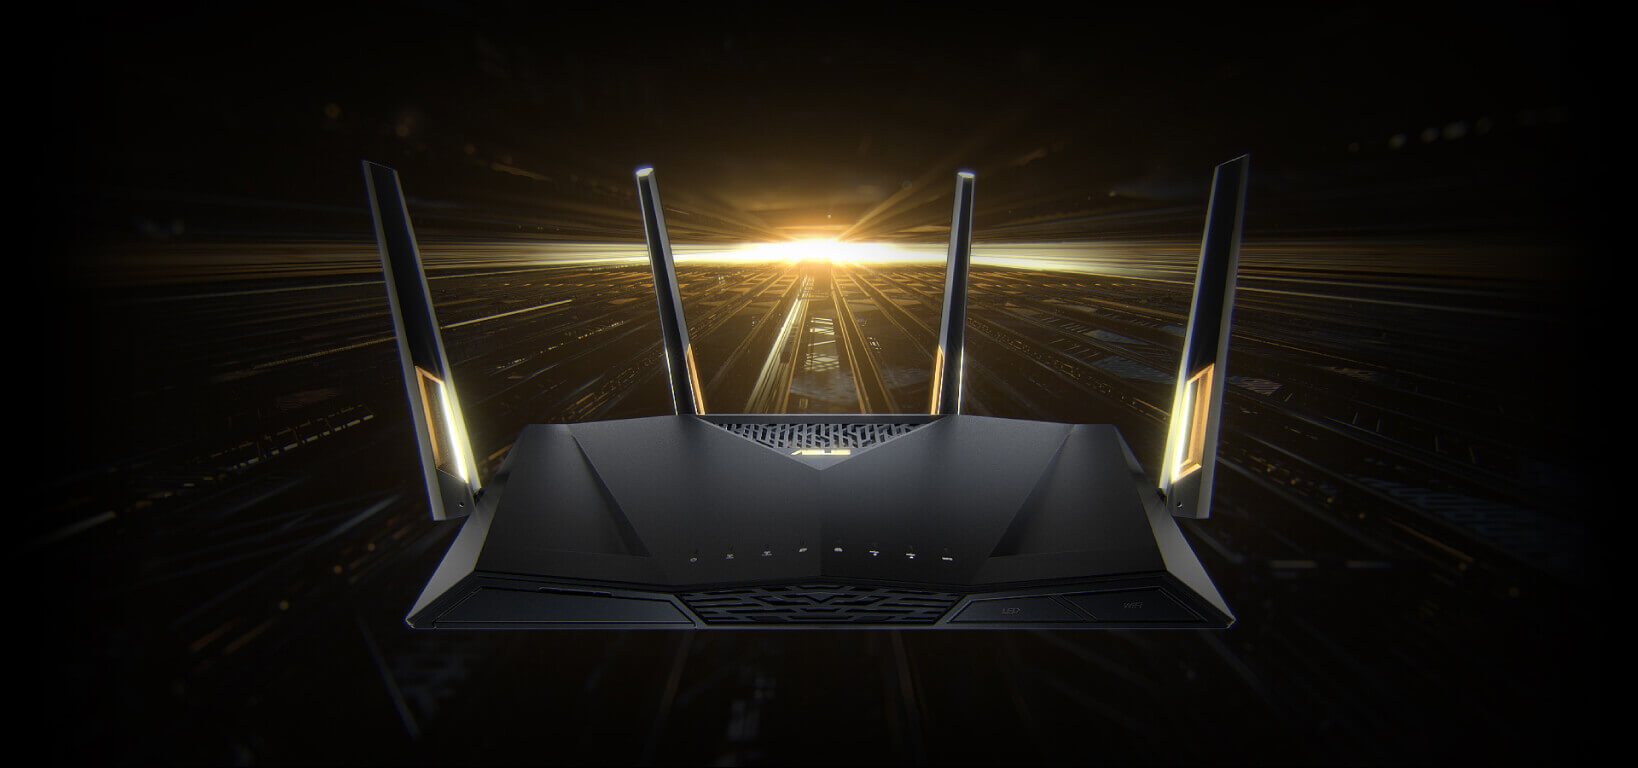 RT-AX88U|WiFi 6|Networking / IoT / Servers |ASUS Global